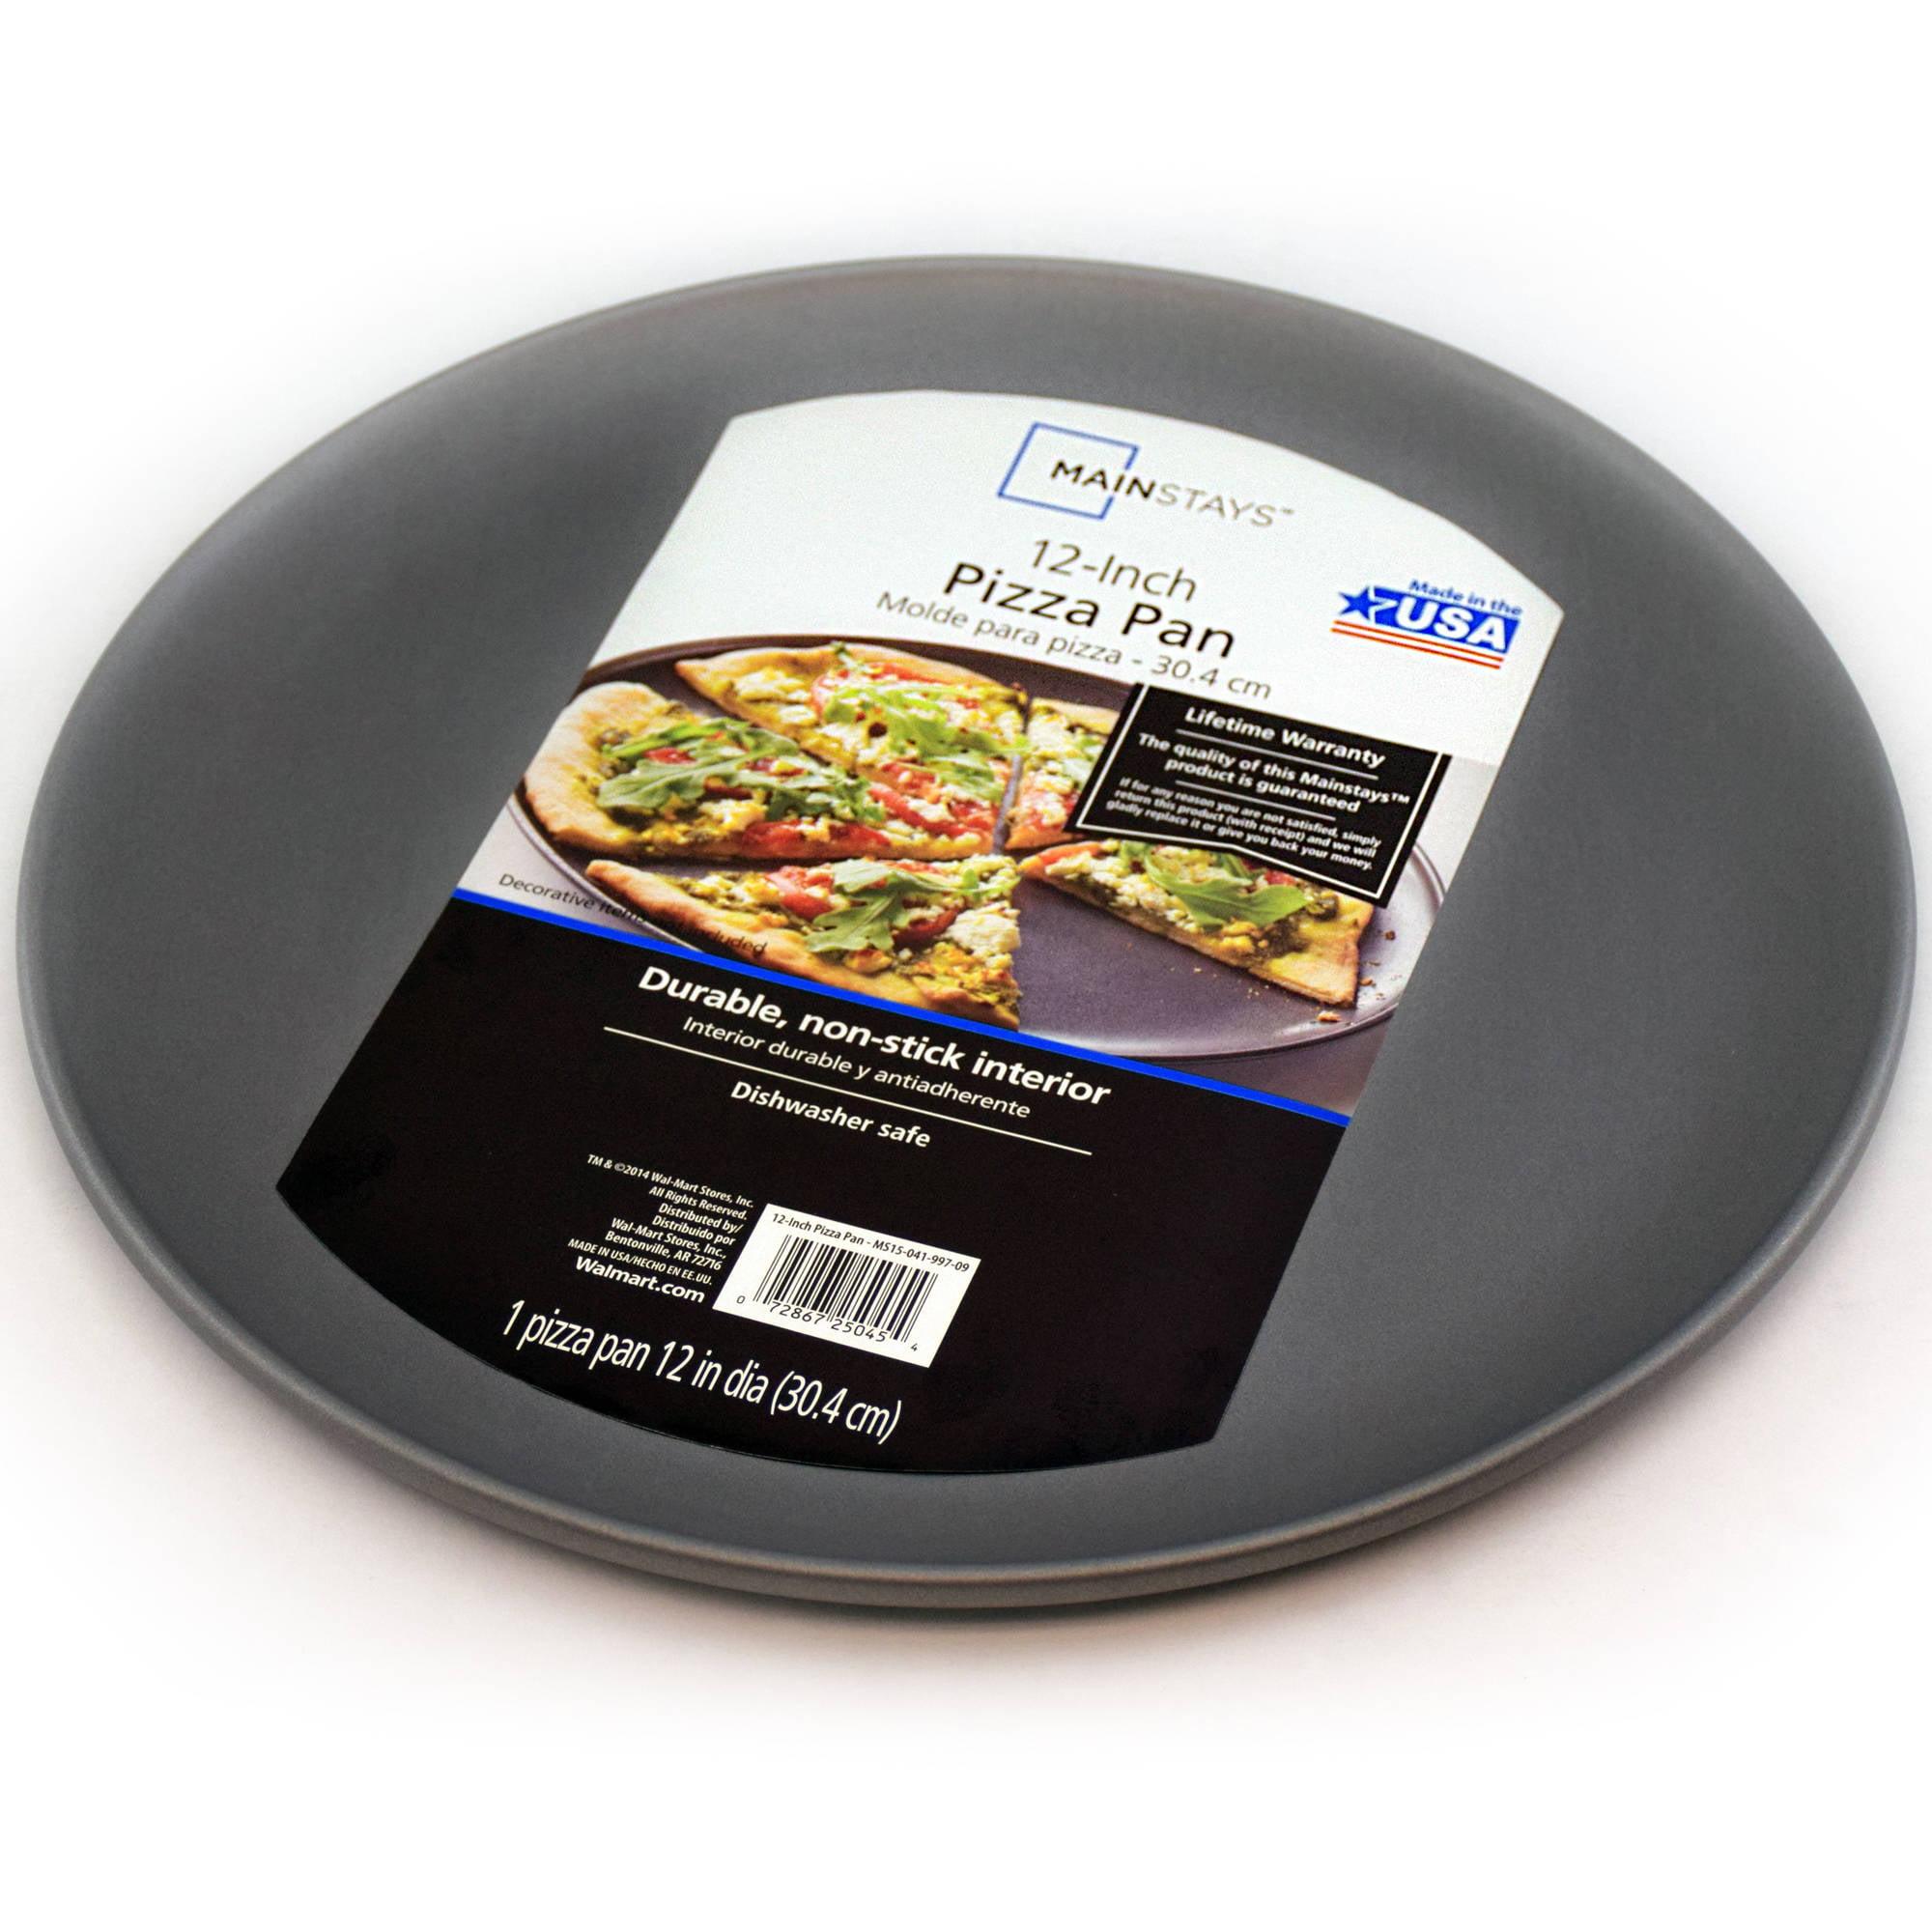 "Mainstays 12"" Non-Stick Pizza Pan"